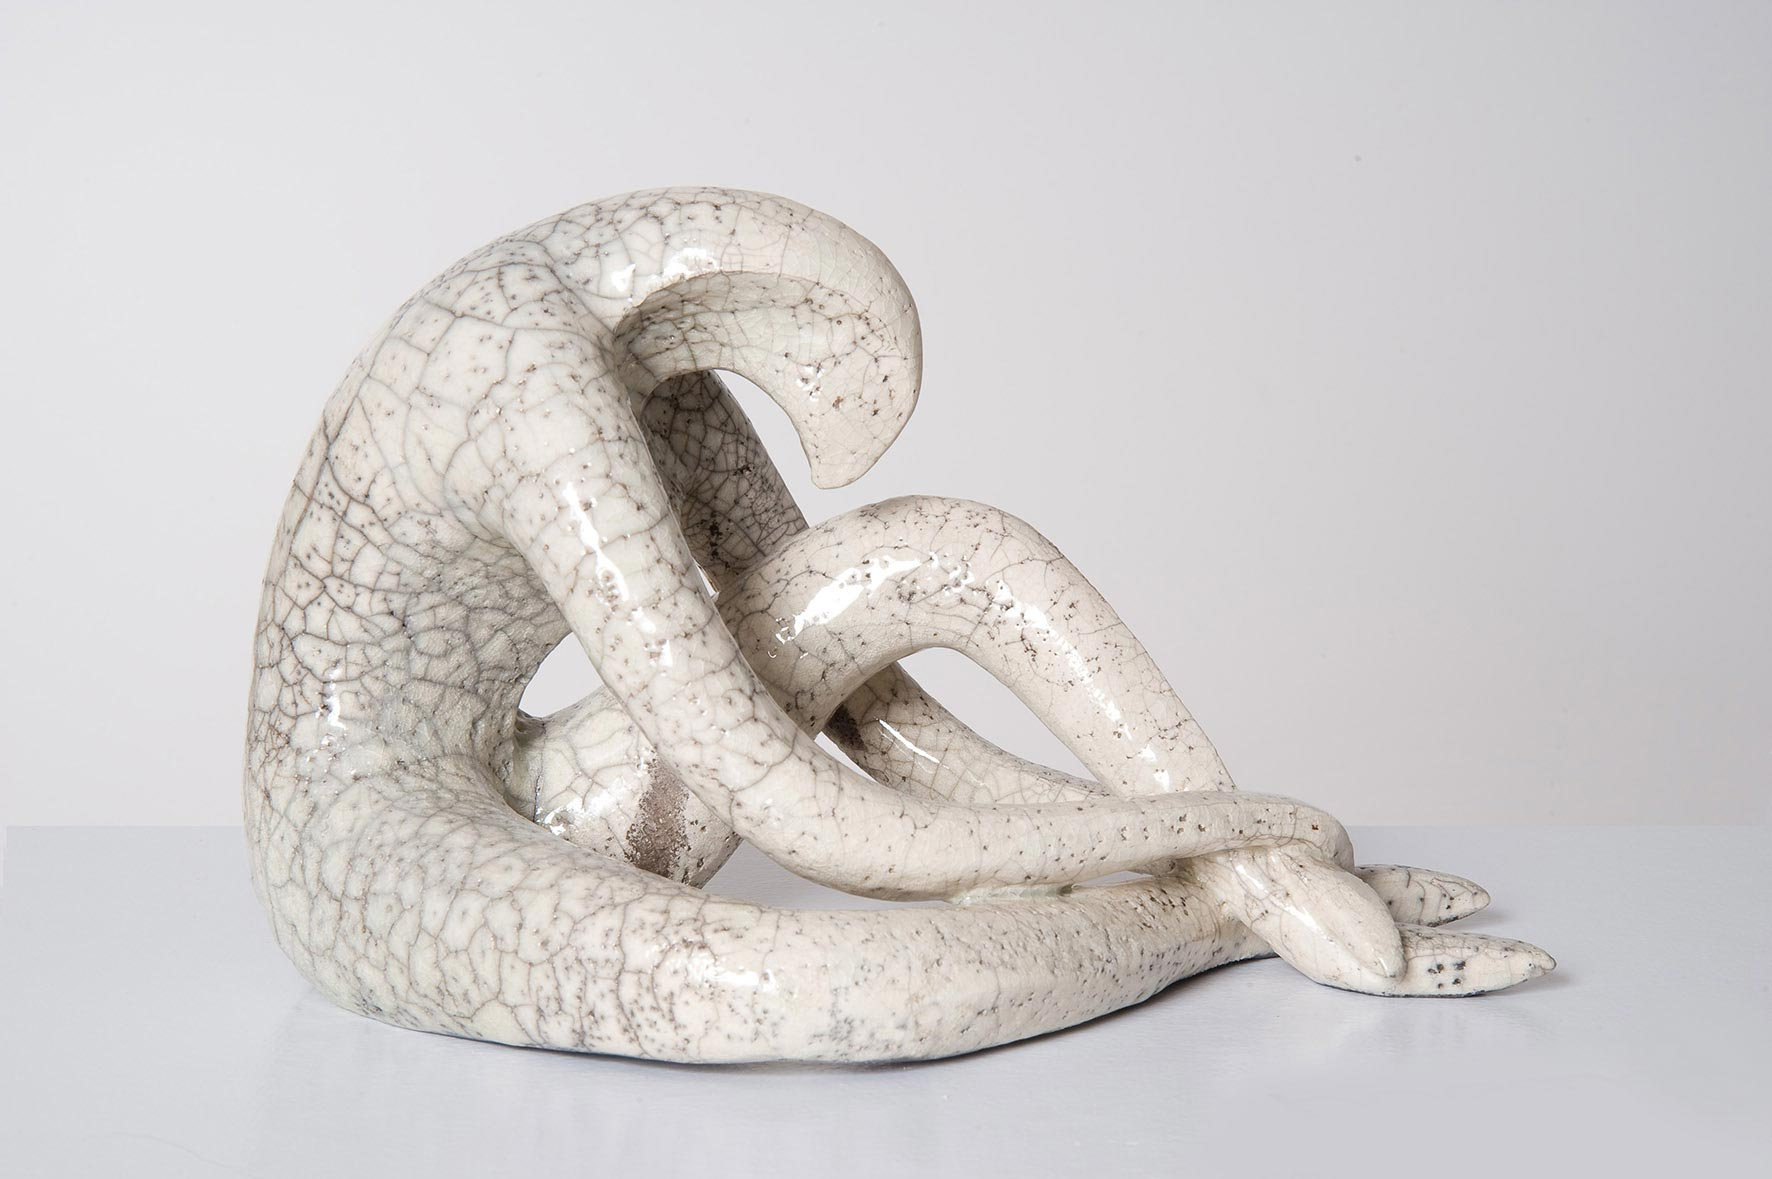 Schlangenmensch, Keramik (Raku), 18/30/18 cm